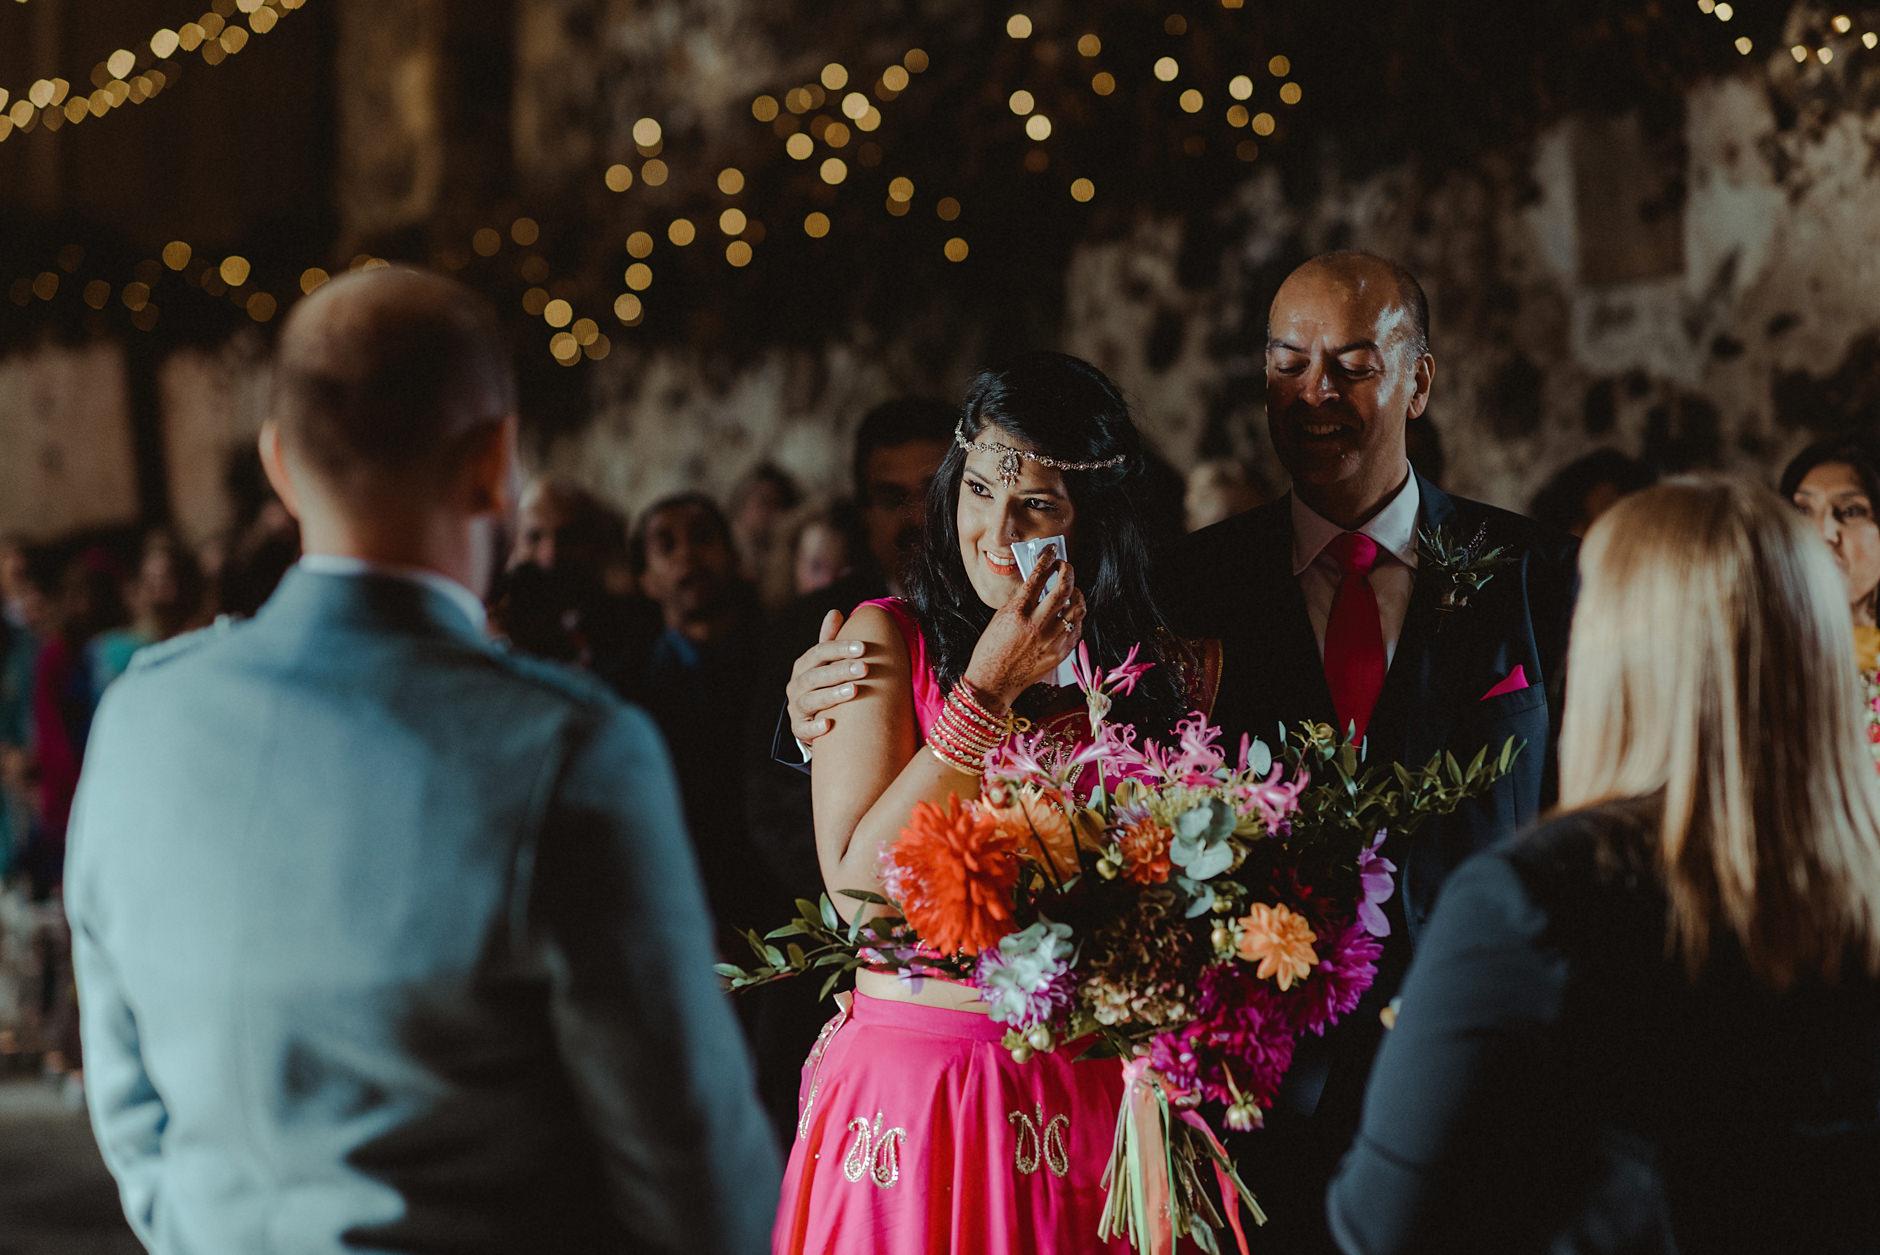 Alternative_wedding_photographer_scotland_nikki_leadbetter-88.jpg